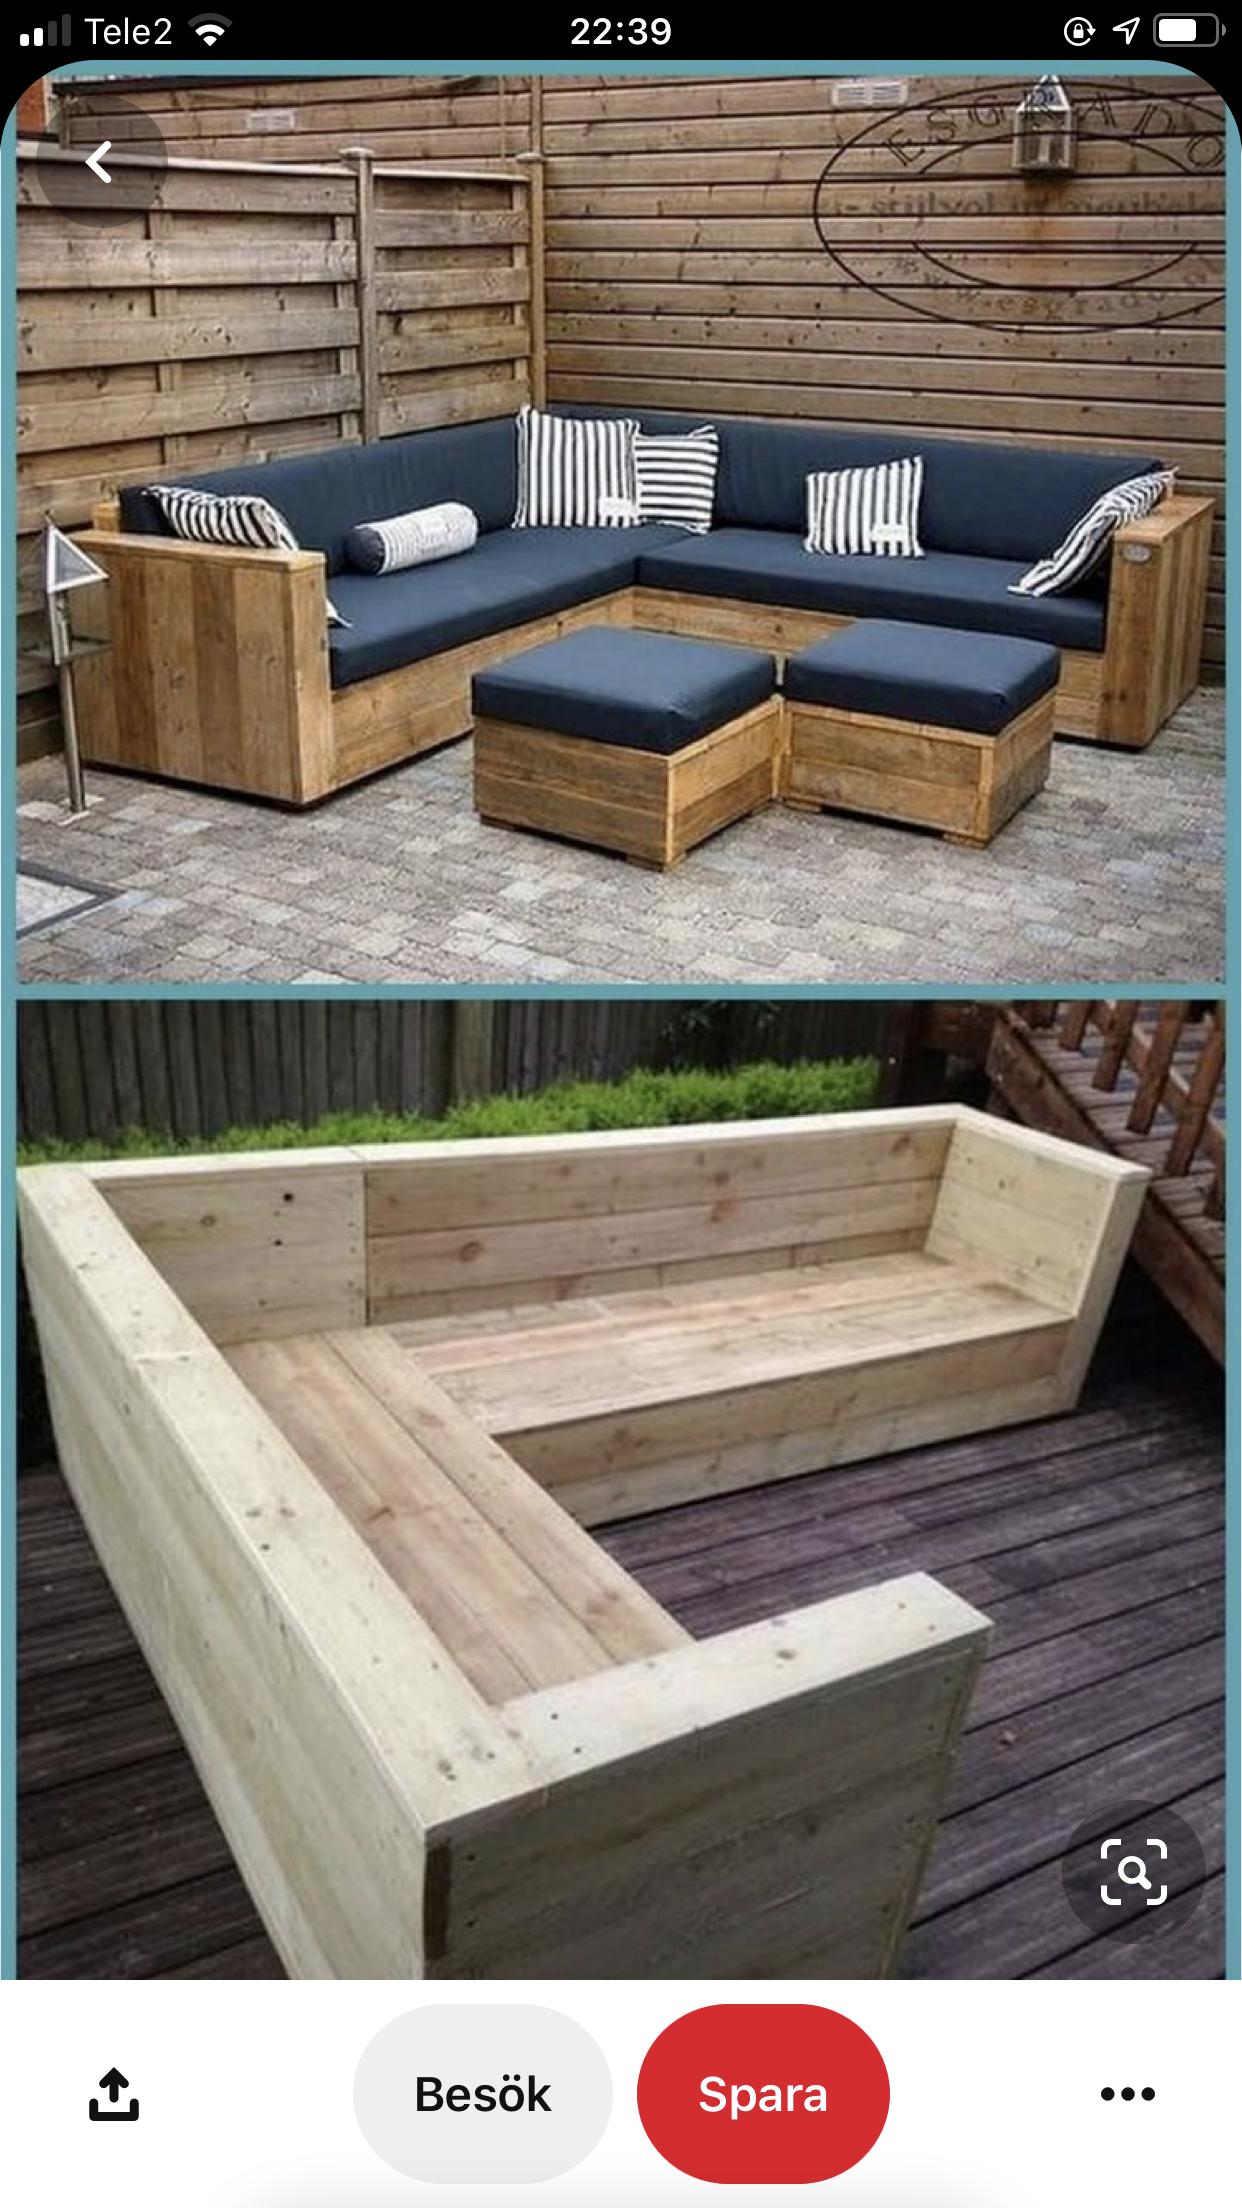 Pin By Melih Ismail On Inredning Garden Furniture Design Wooden Patio Furniture Pallet Furniture Outdoor [ 2208 x 1242 Pixel ]